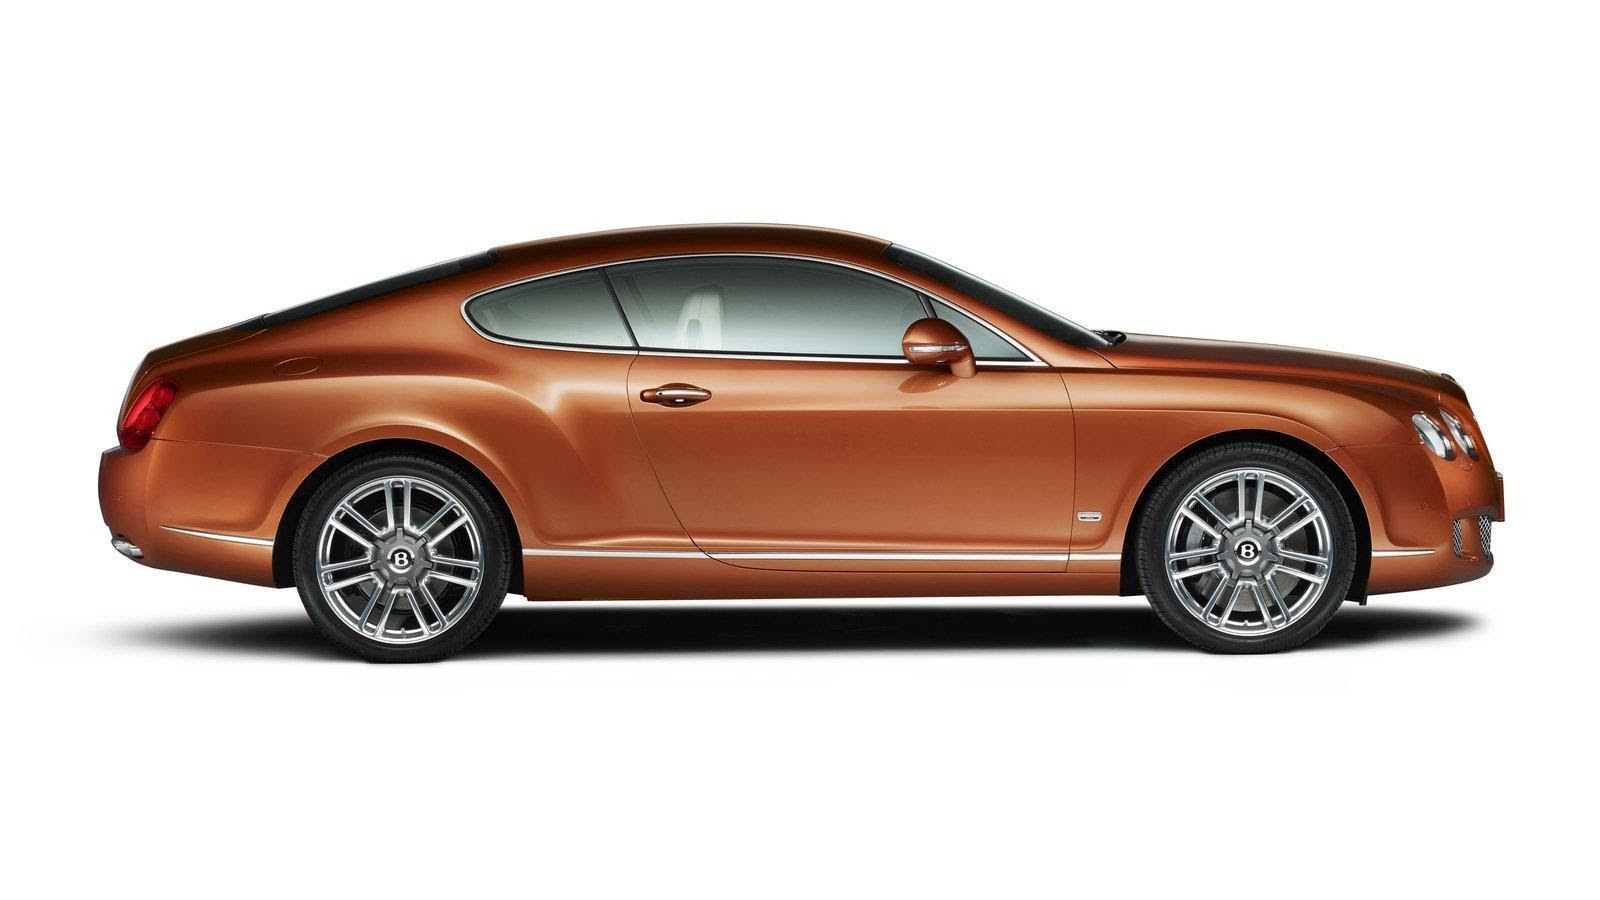 Bentley Continental Gt Wiring Diagrams Fuse Box 07 Design Series China Edition Autocar